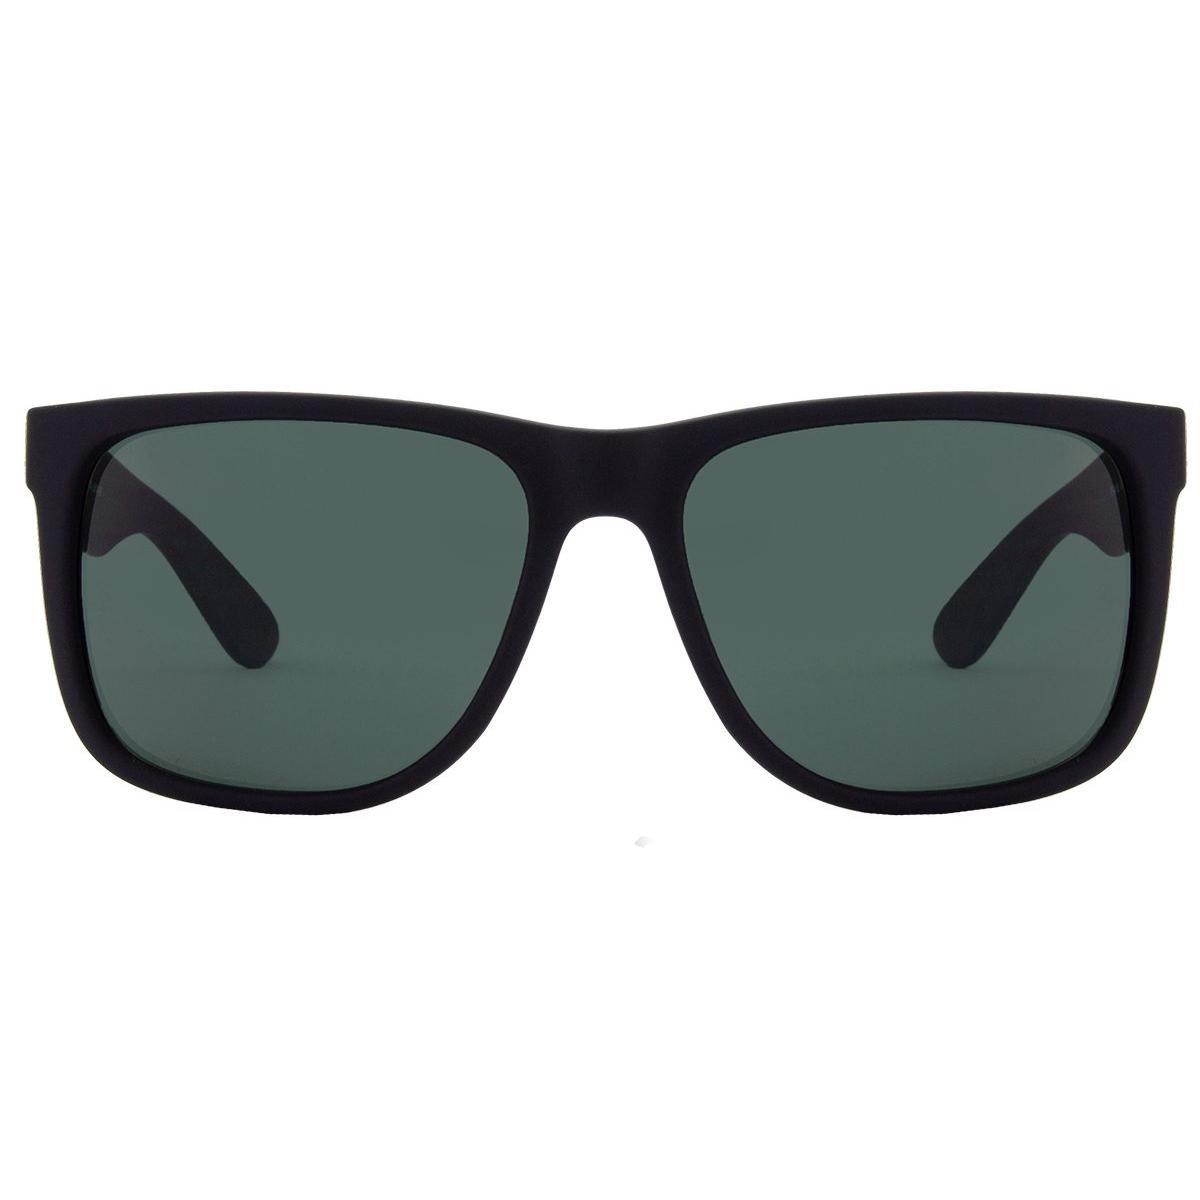 Óculos de Sol Ray-Ban Justin RB4165L - 852 88 57 - Compre Agora ... 14edd8cf02